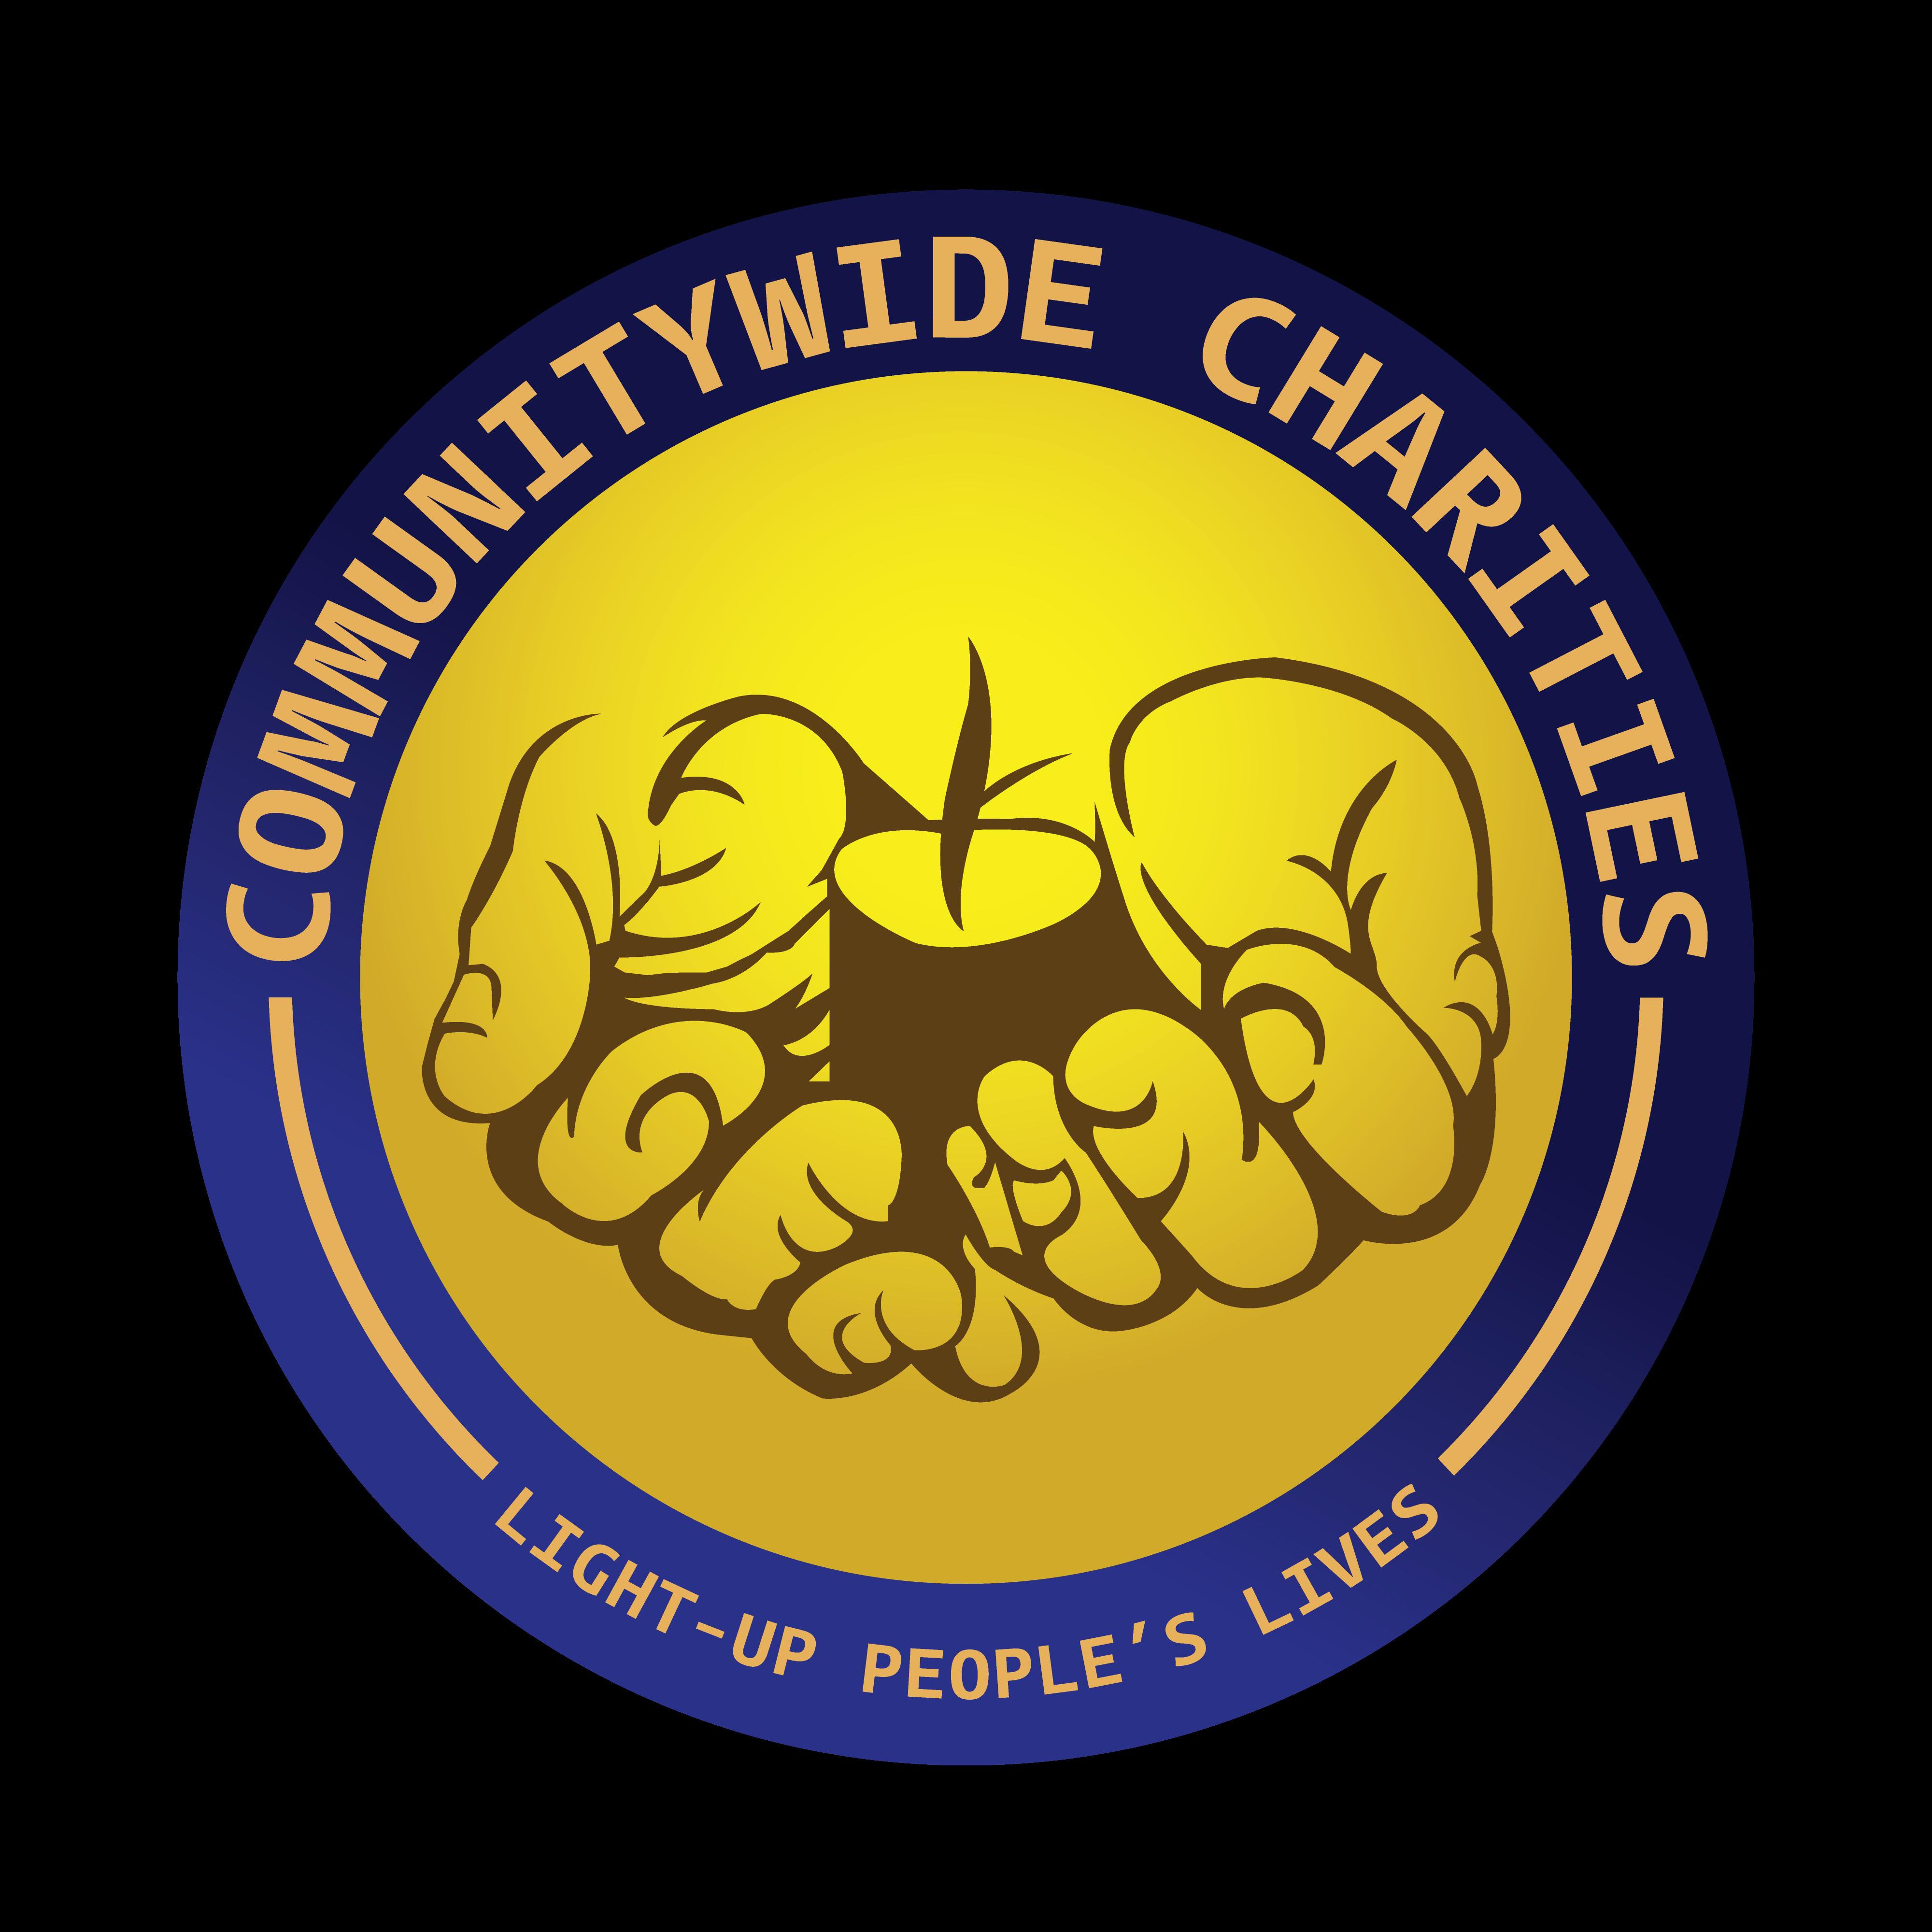 Communitywide